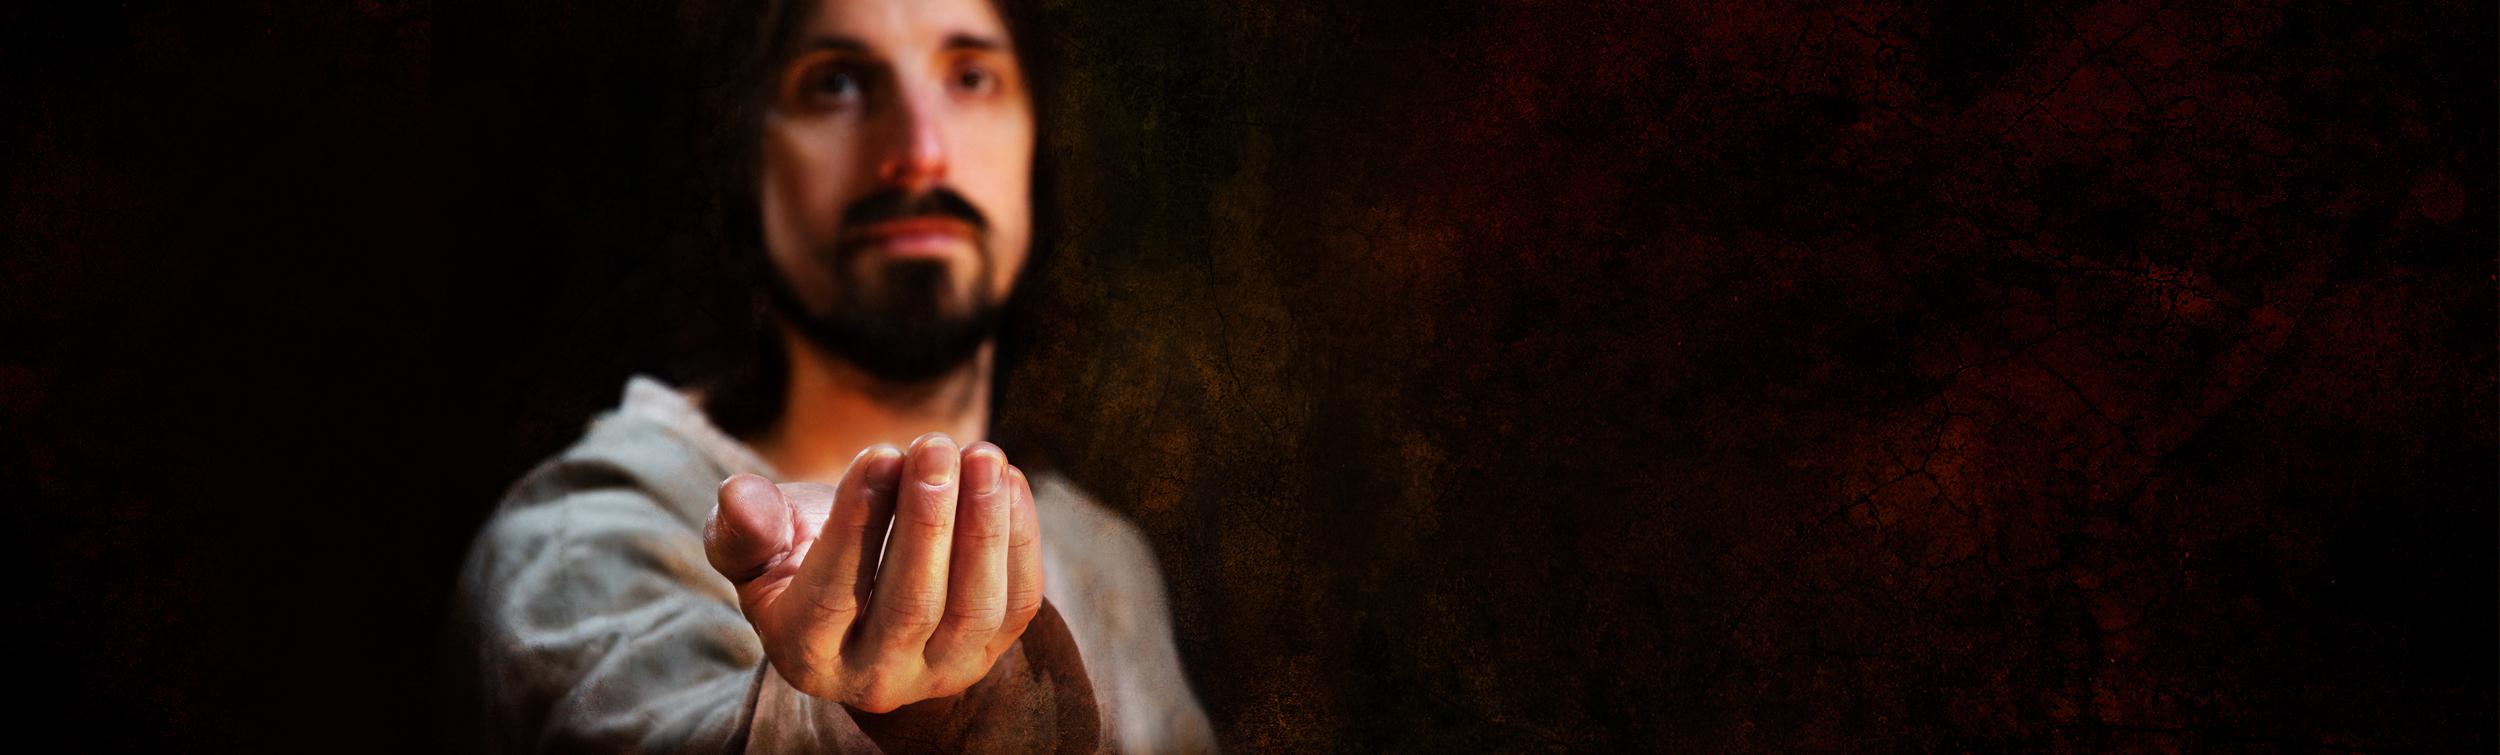 Jezus-slider